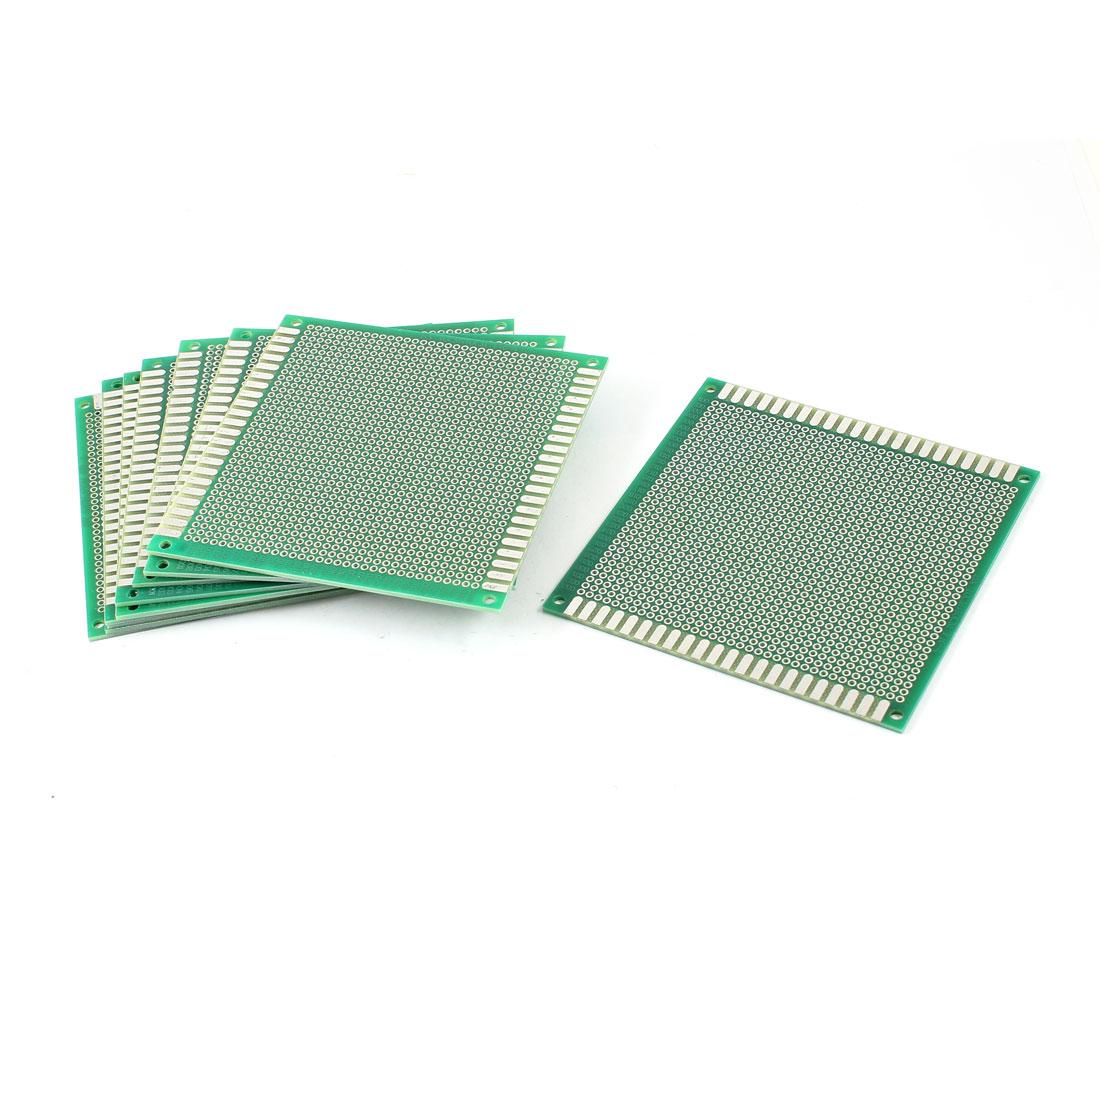 10 Pcs DIY Single Side Tinned Prototyping PCB Circuit Universal Board 10cmx10cm